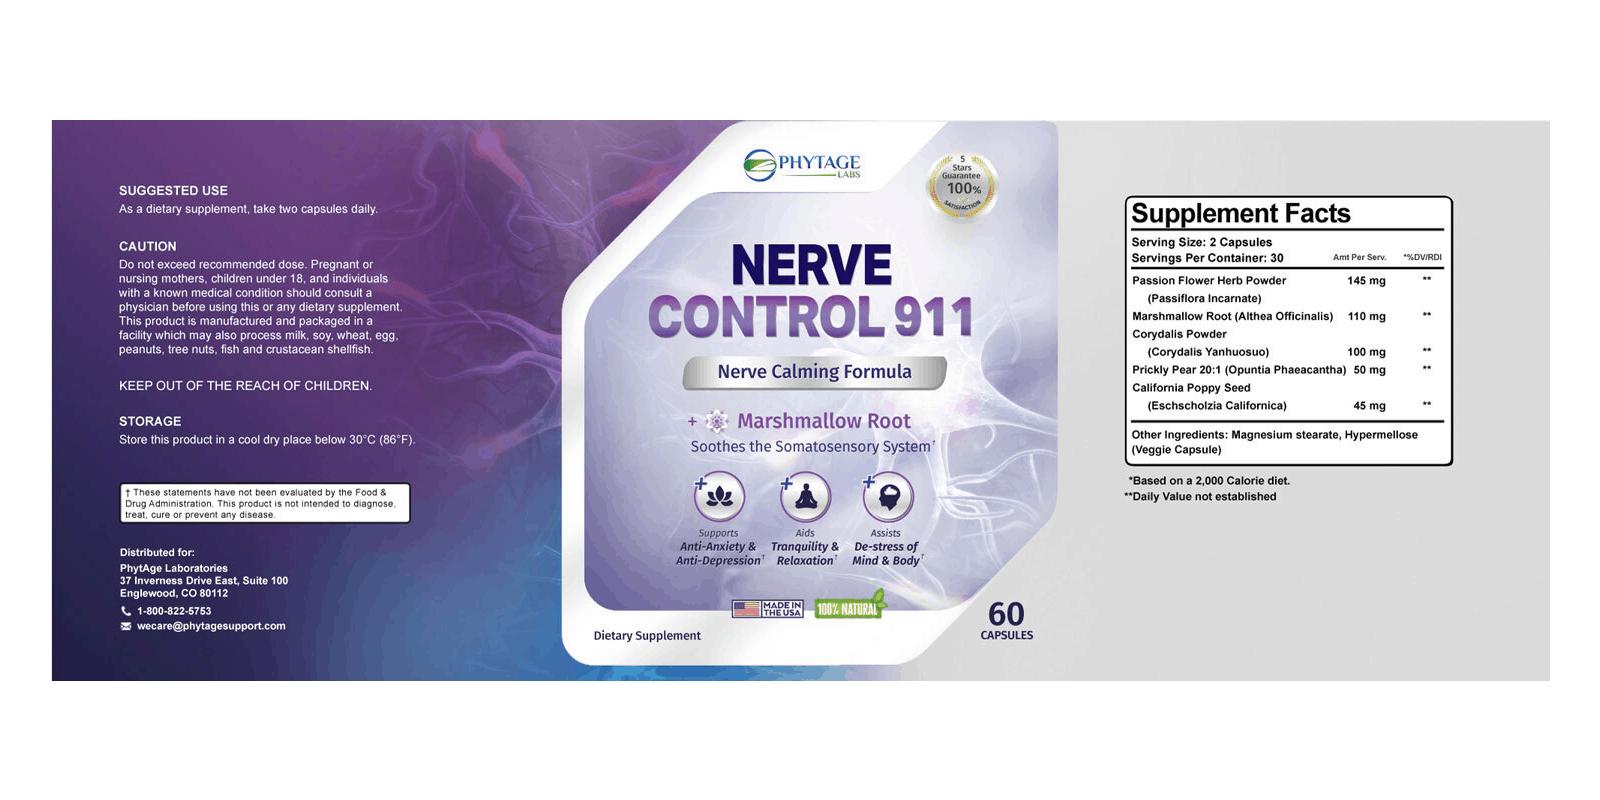 Nerve Control 911 dosage